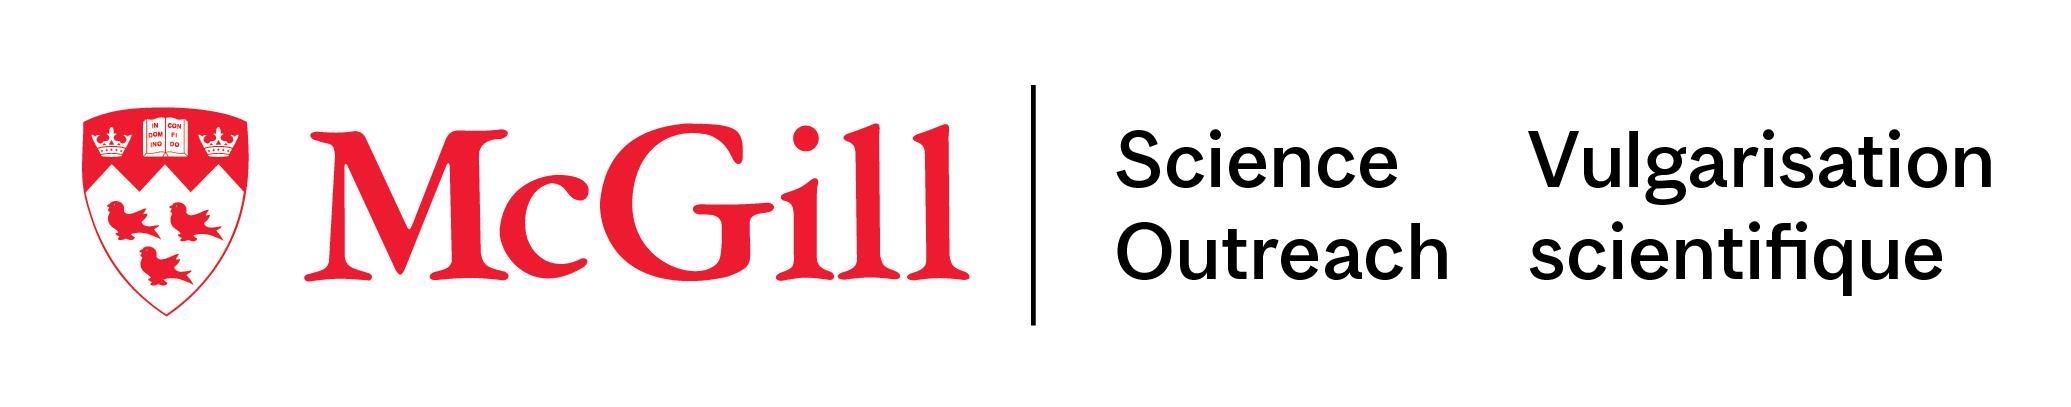 McGill Science Outreach